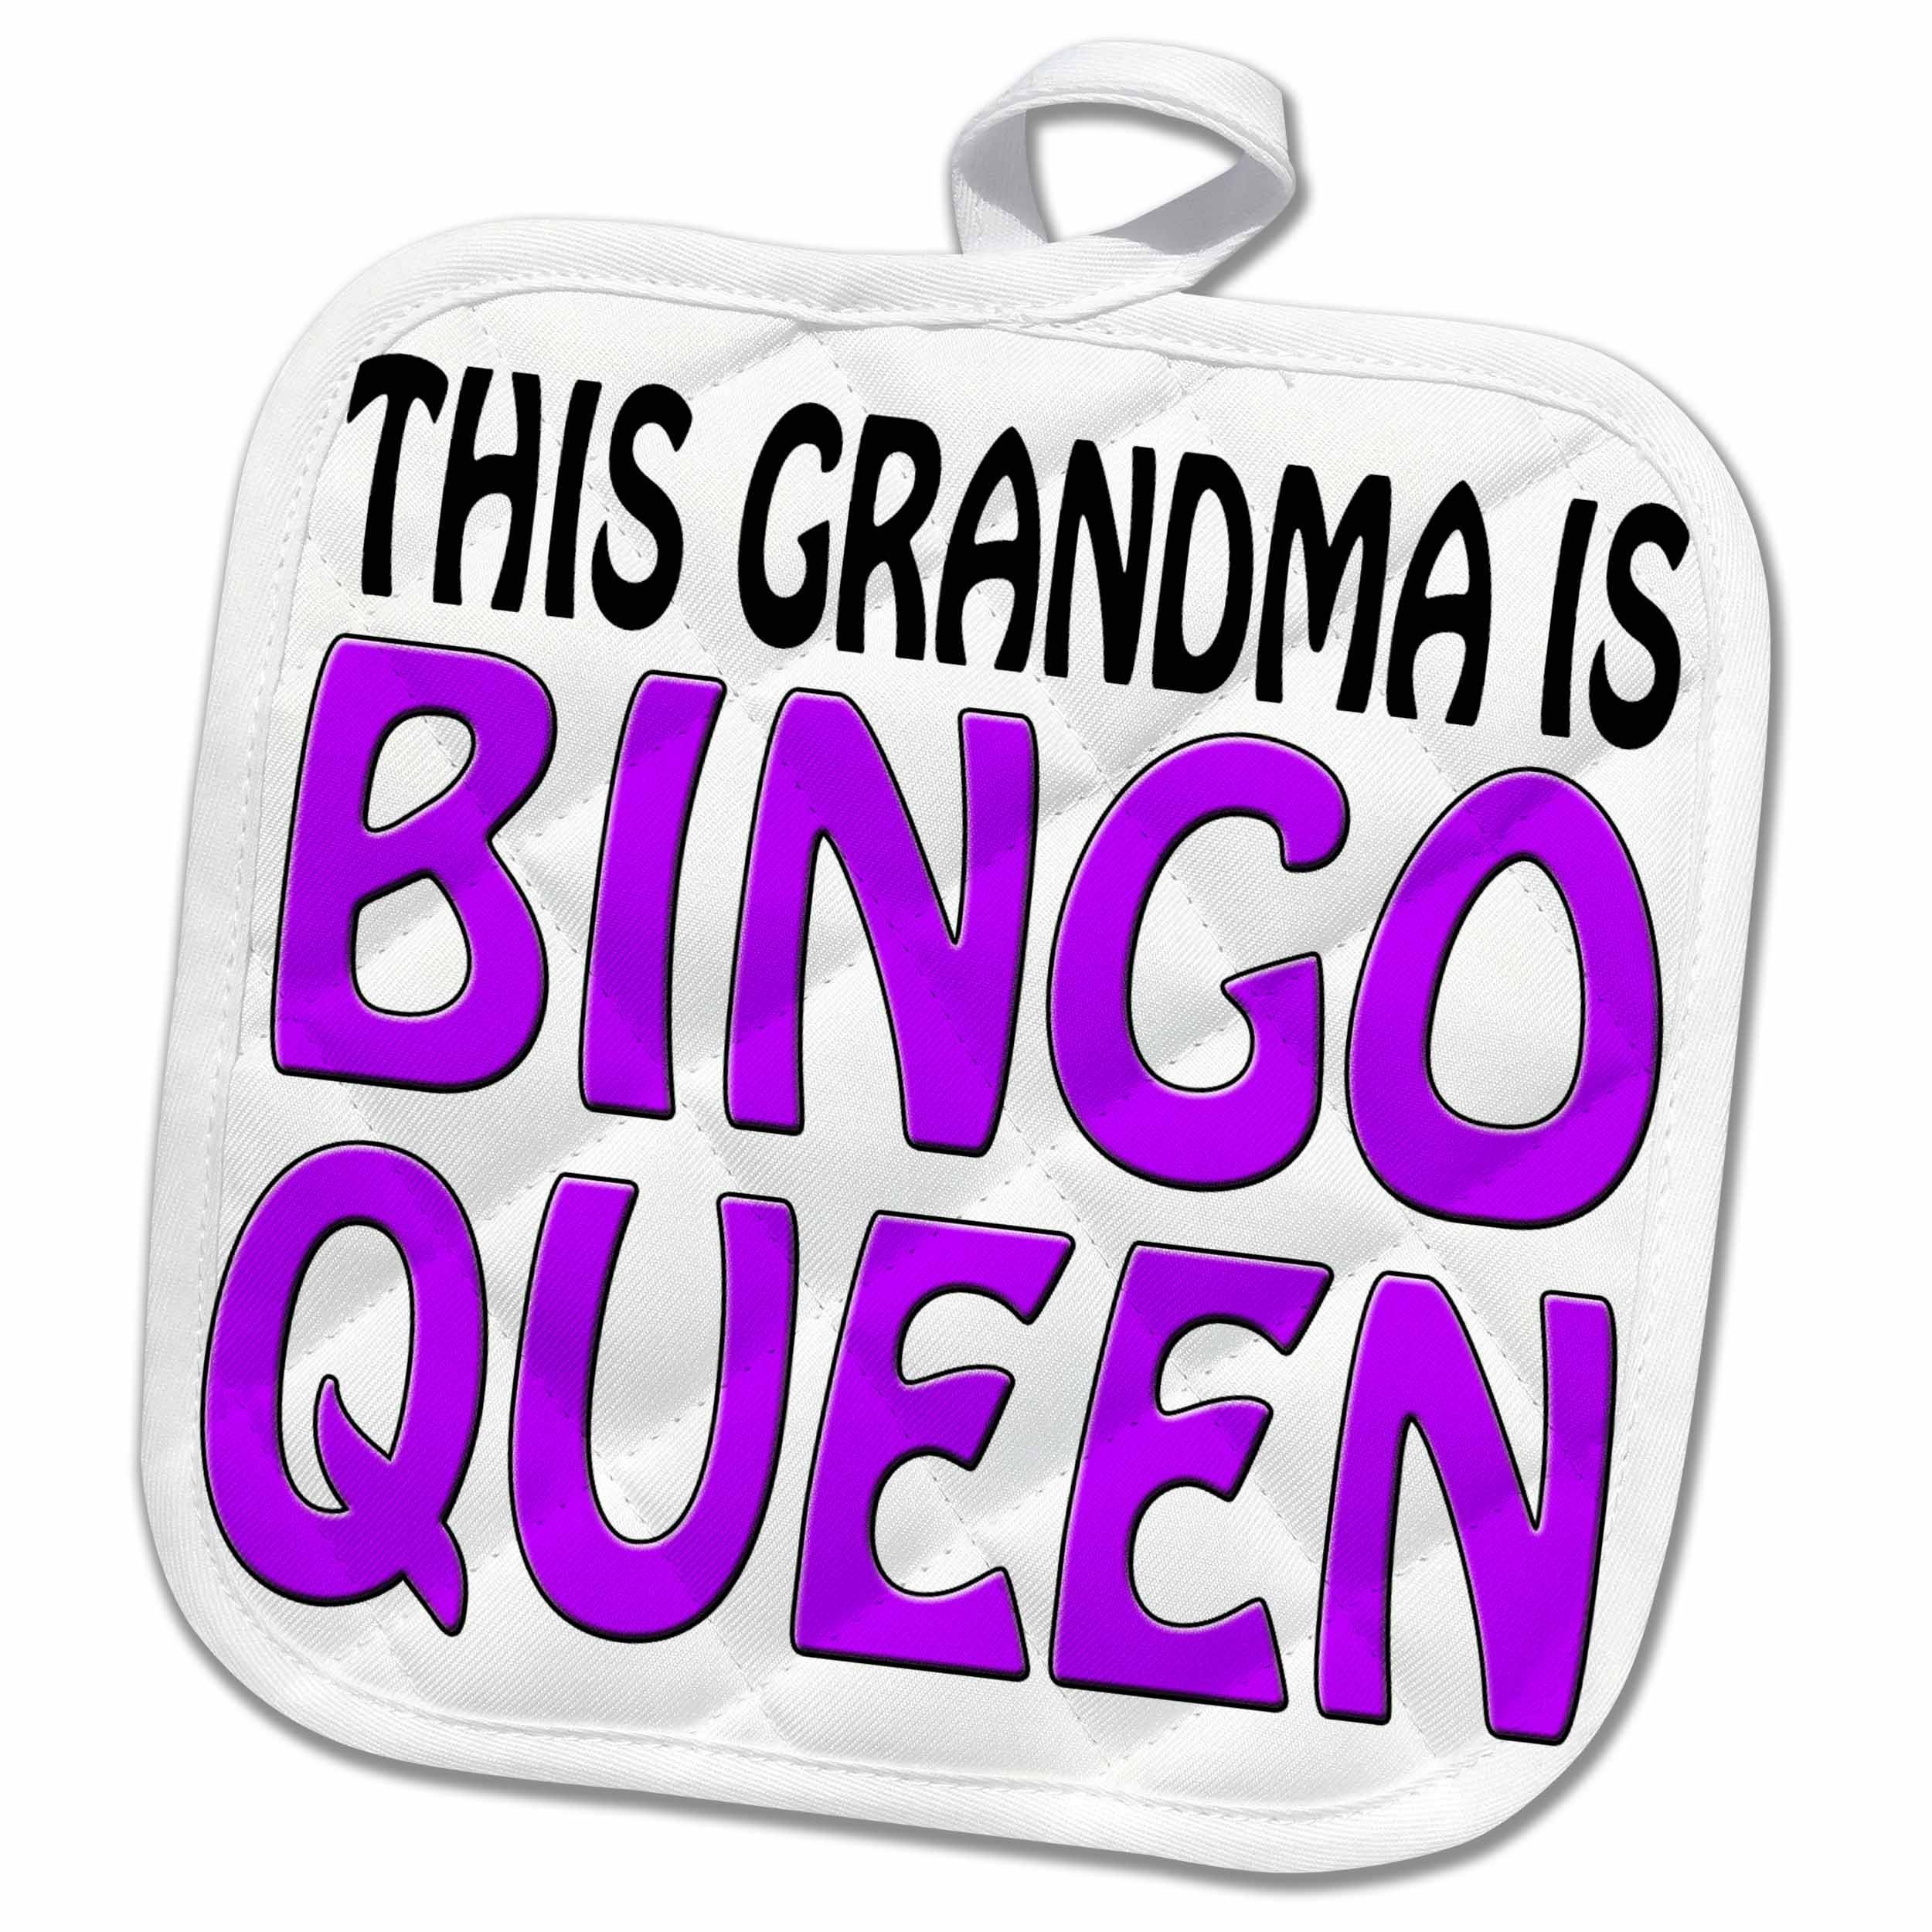 3dRose EvaDane - Funny Quotes - This grandma is bingo queen, Purple, 8x8 Potholder (phl_149773_1) by 3dRose